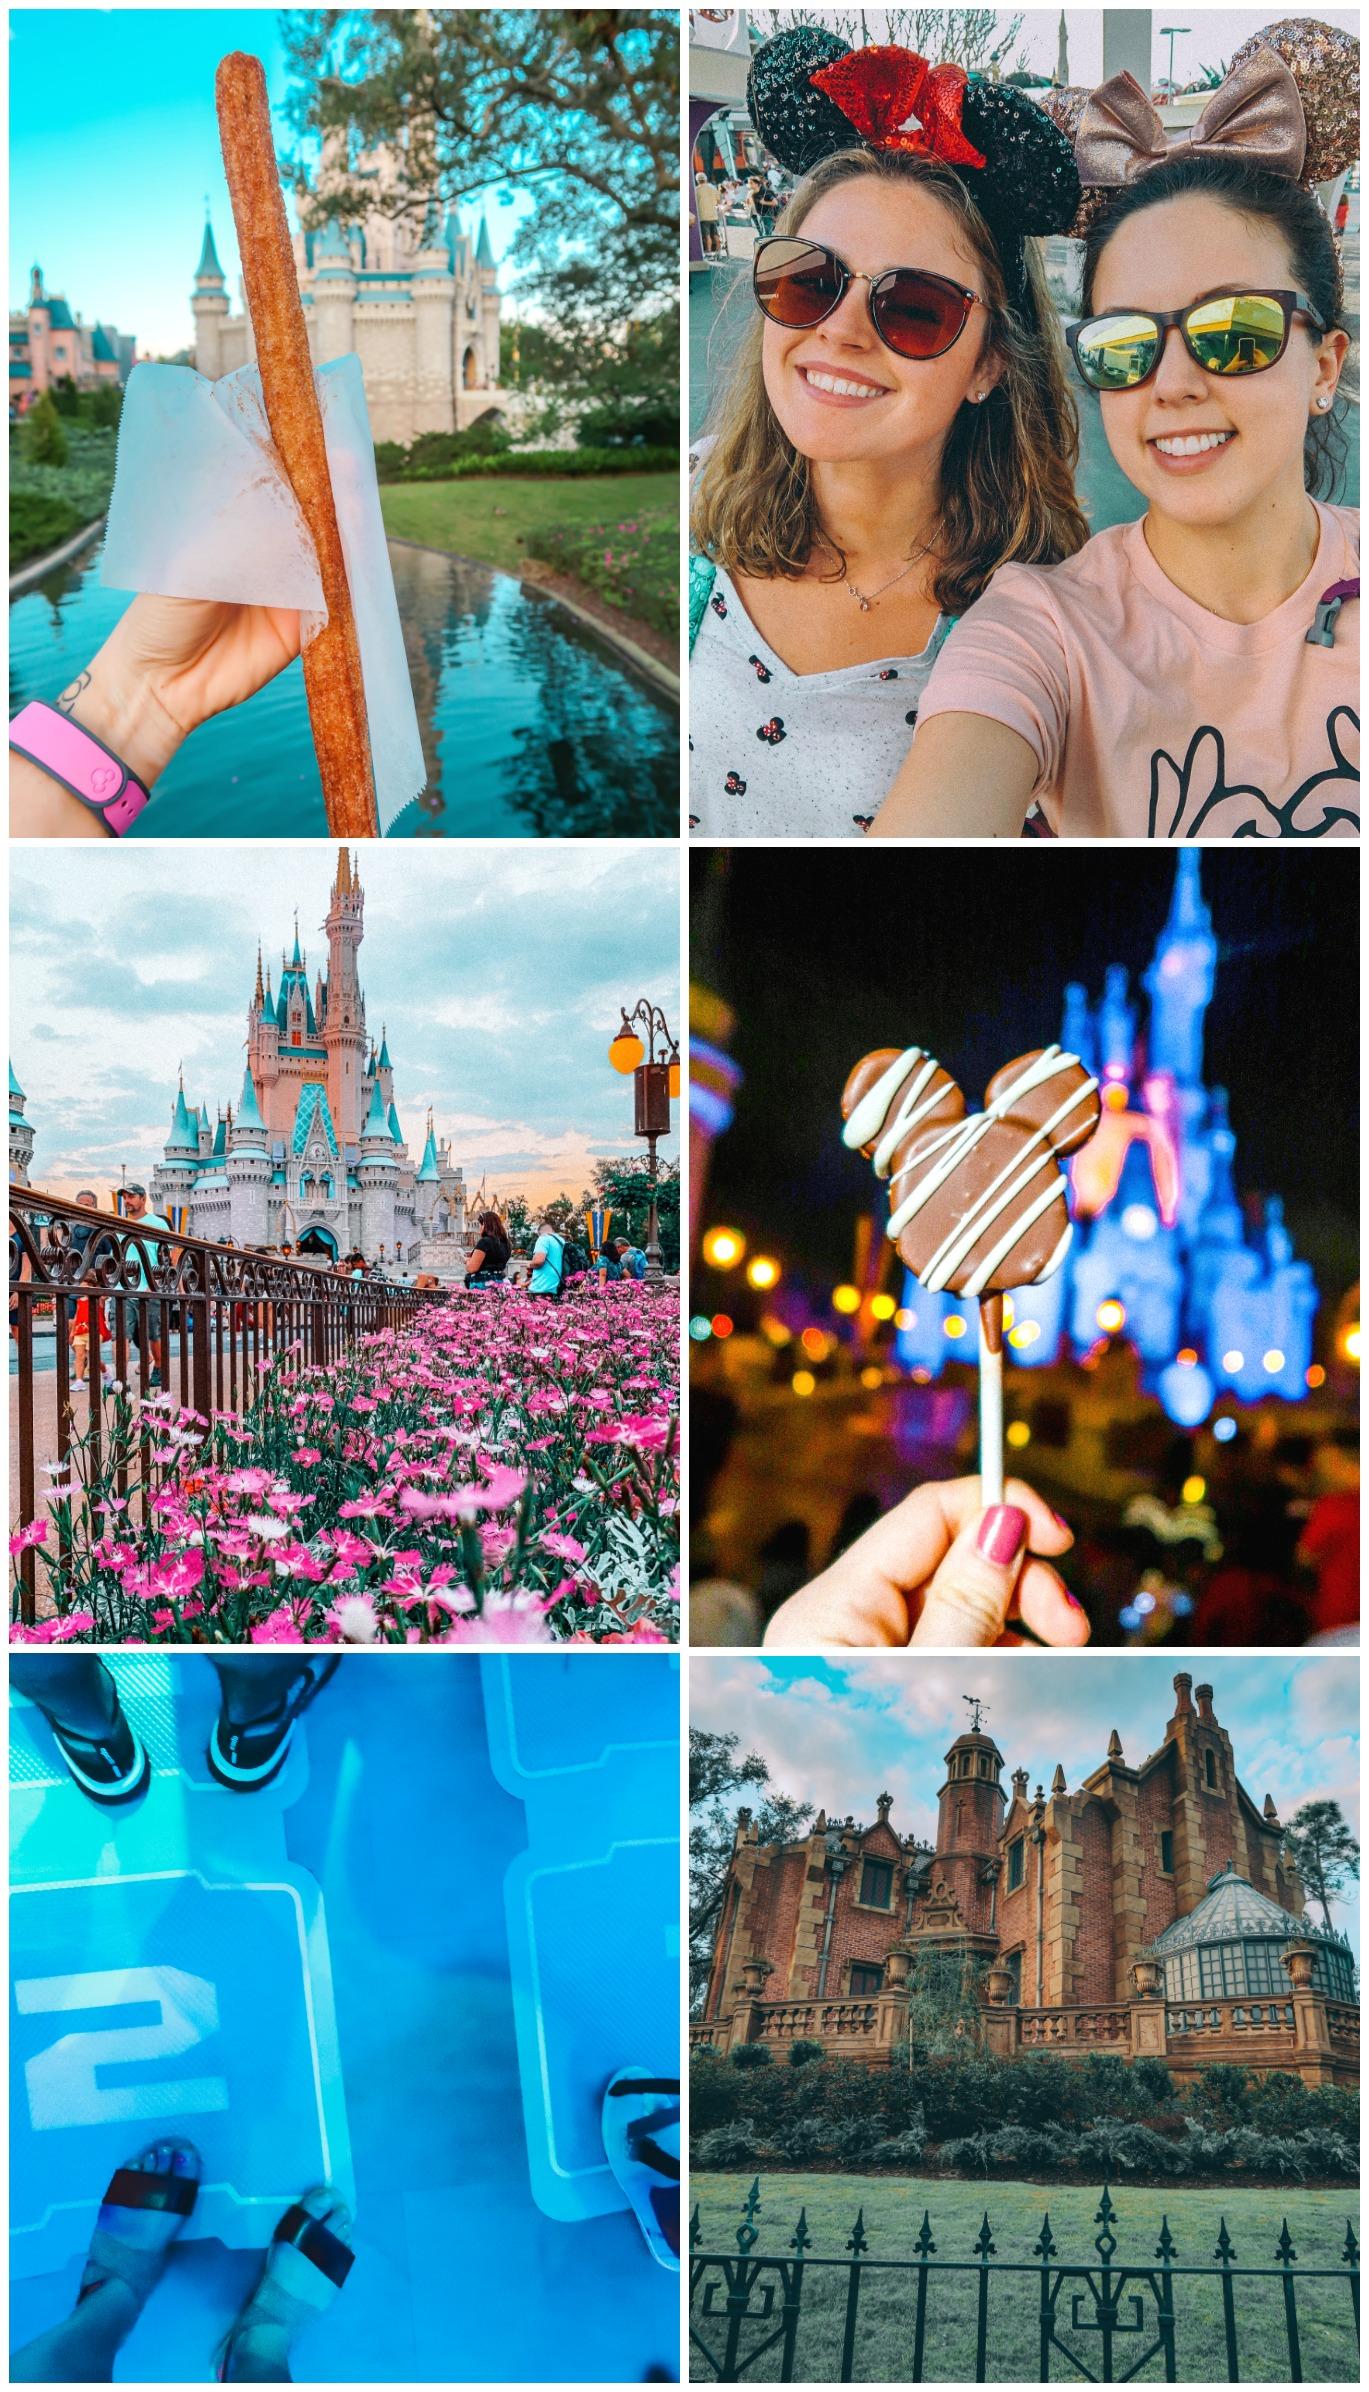 The Ultimate Week Walt Disney World Itinerary Travel Magic Kingdom churro cake pop fast passes